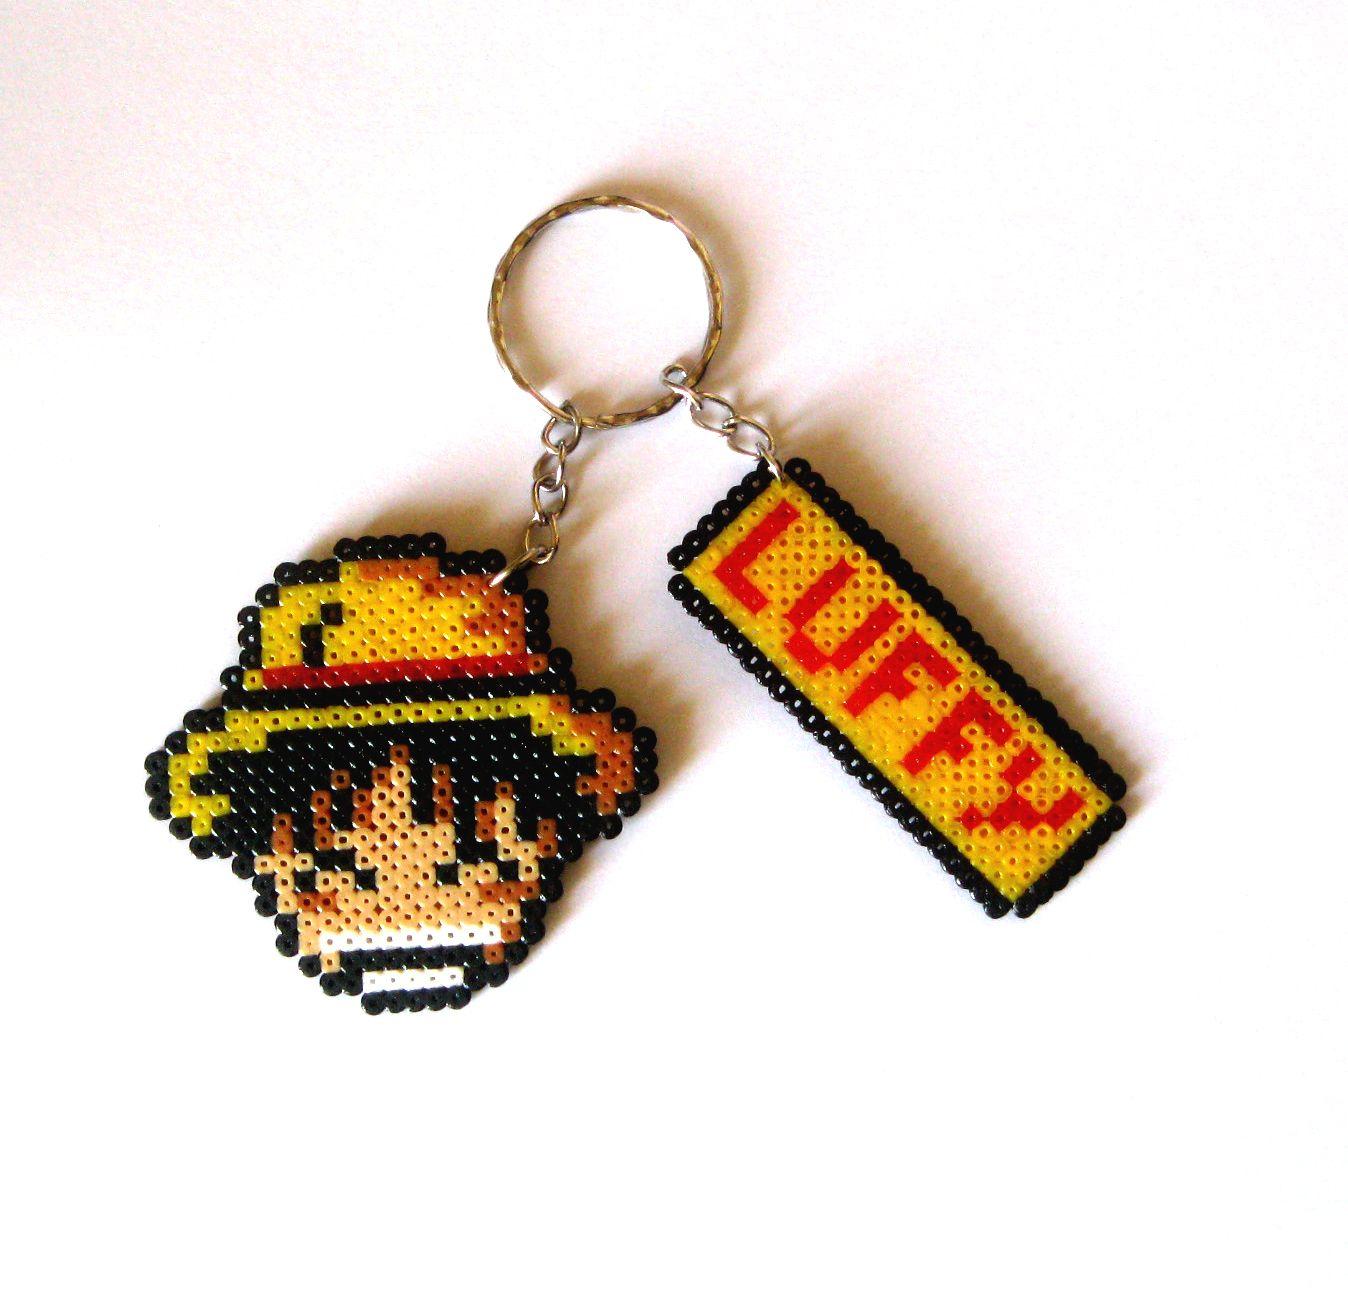 Monkey D. Luffy - One Piece keyring hama mini beads by Regalopia Freak Creations - www.etsy.com/Shop/FreakCreations